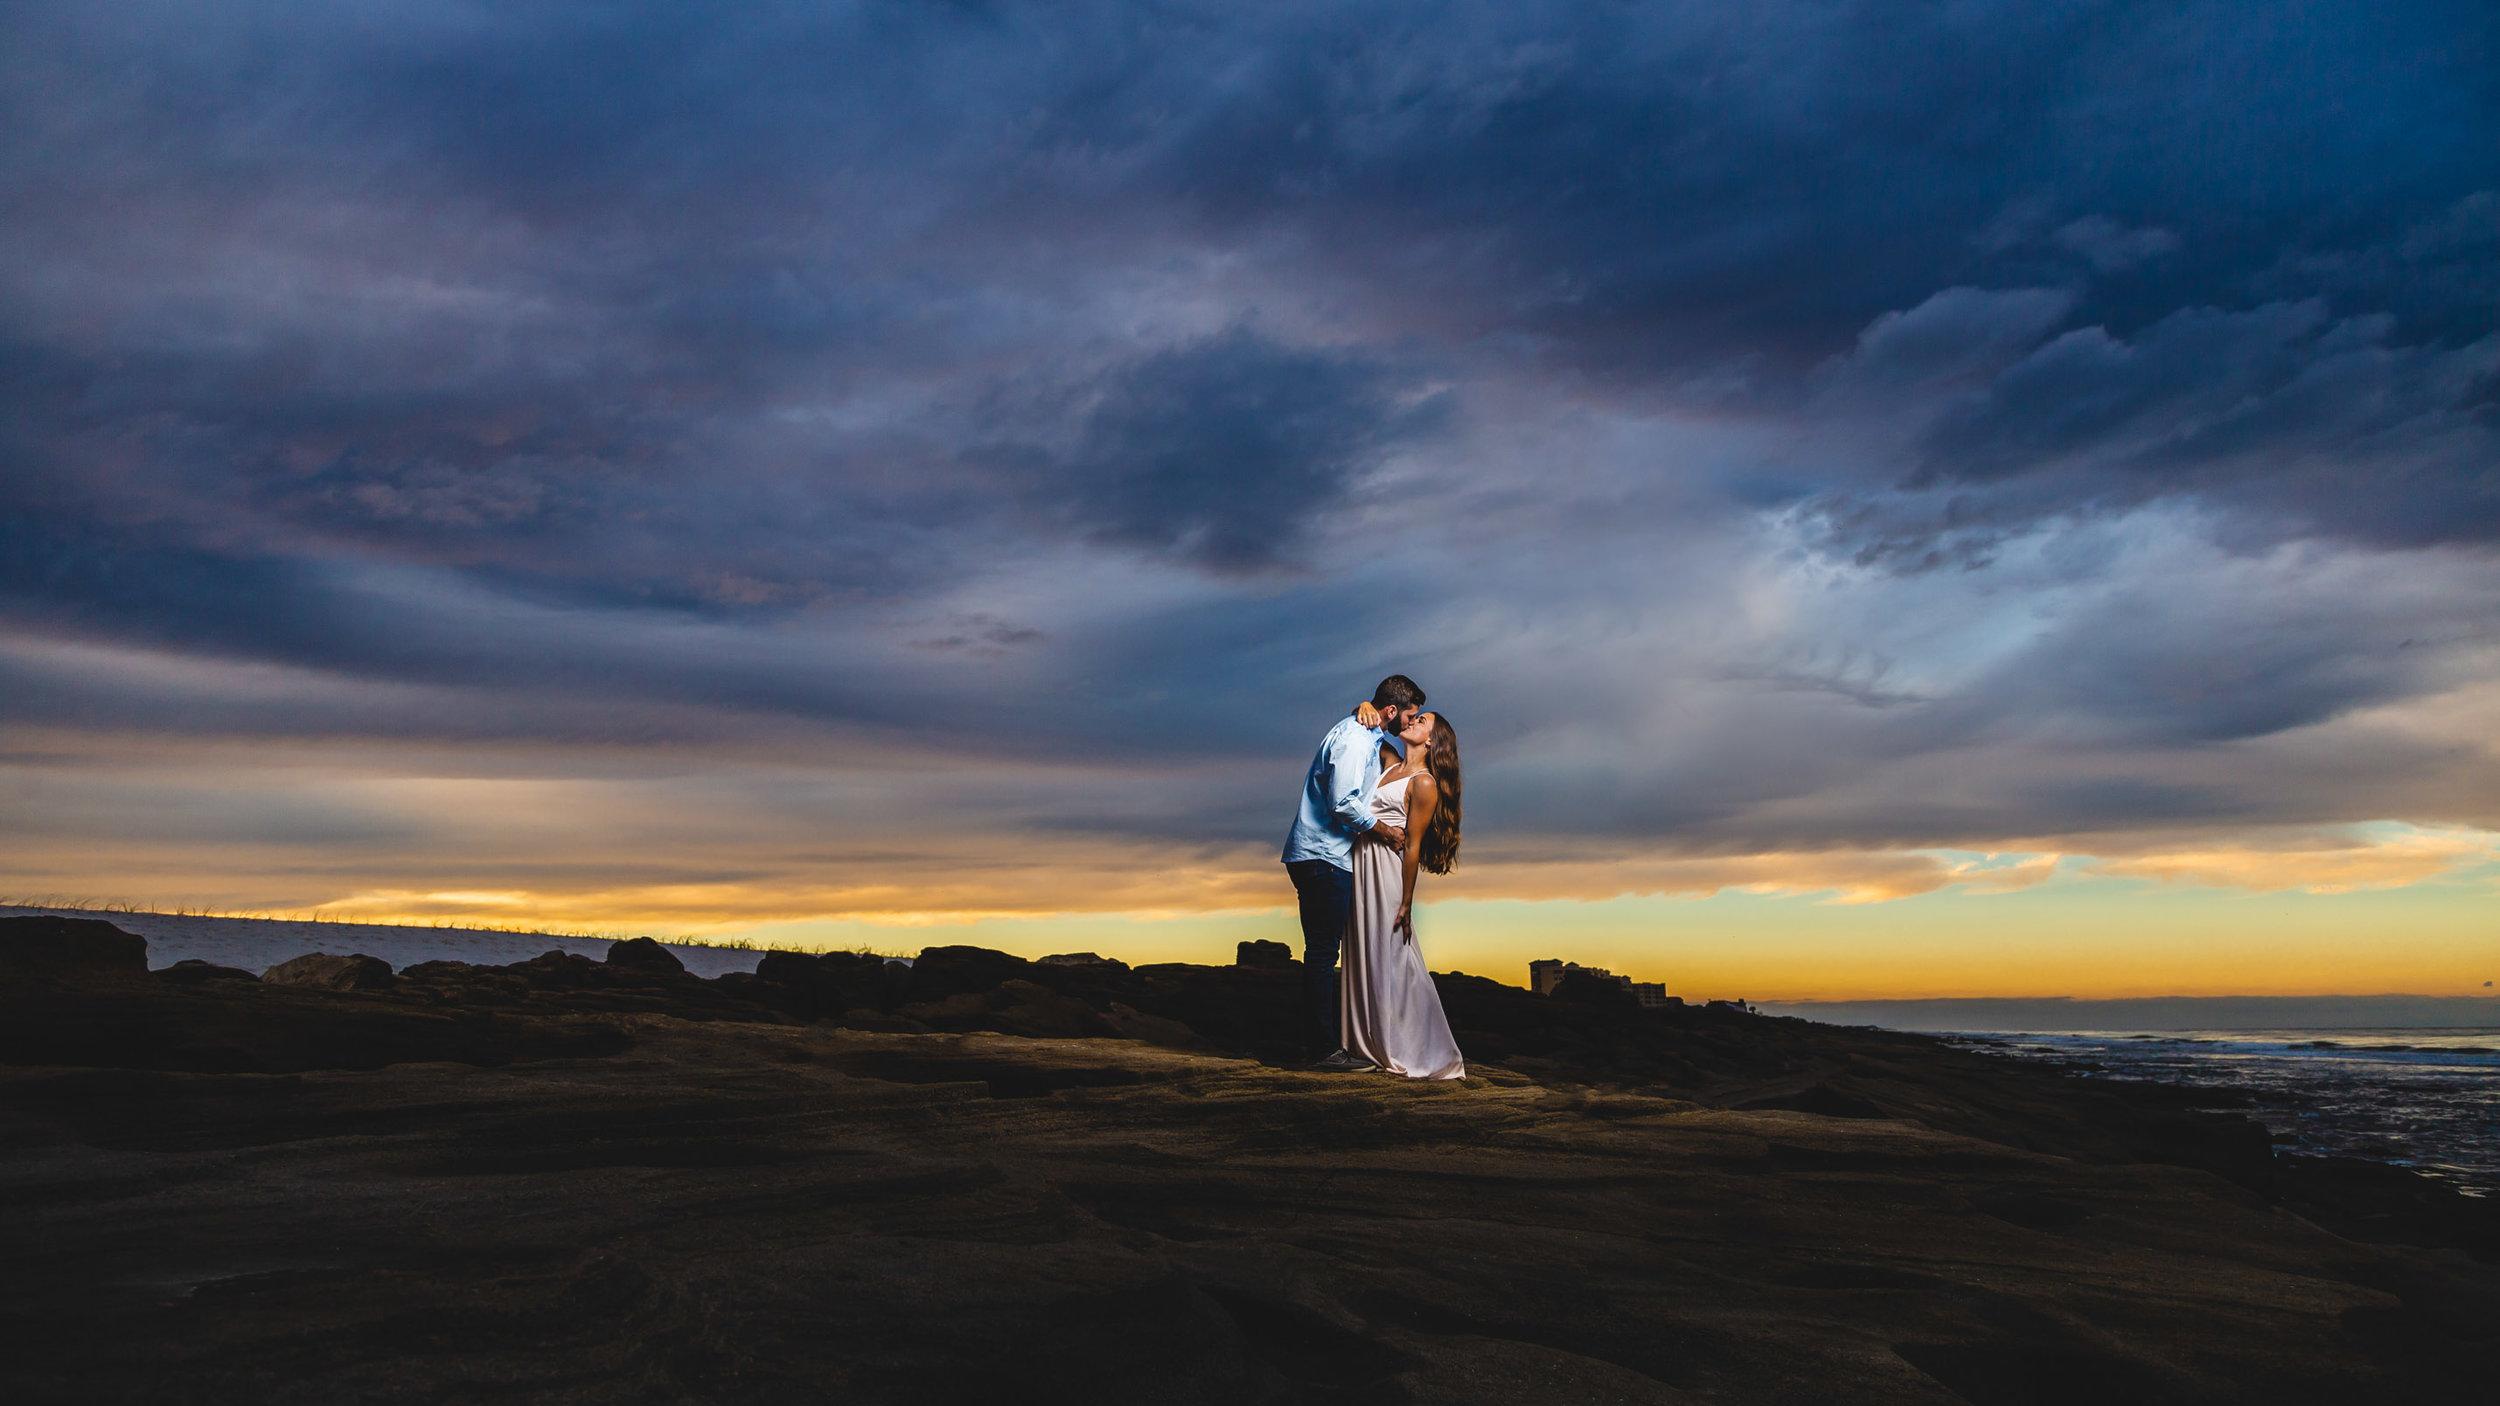 adam-szarmack-jacksonville-wedding-photographer-palm-coast-washing-oaks-garden-state-park-engagement-47.jpg